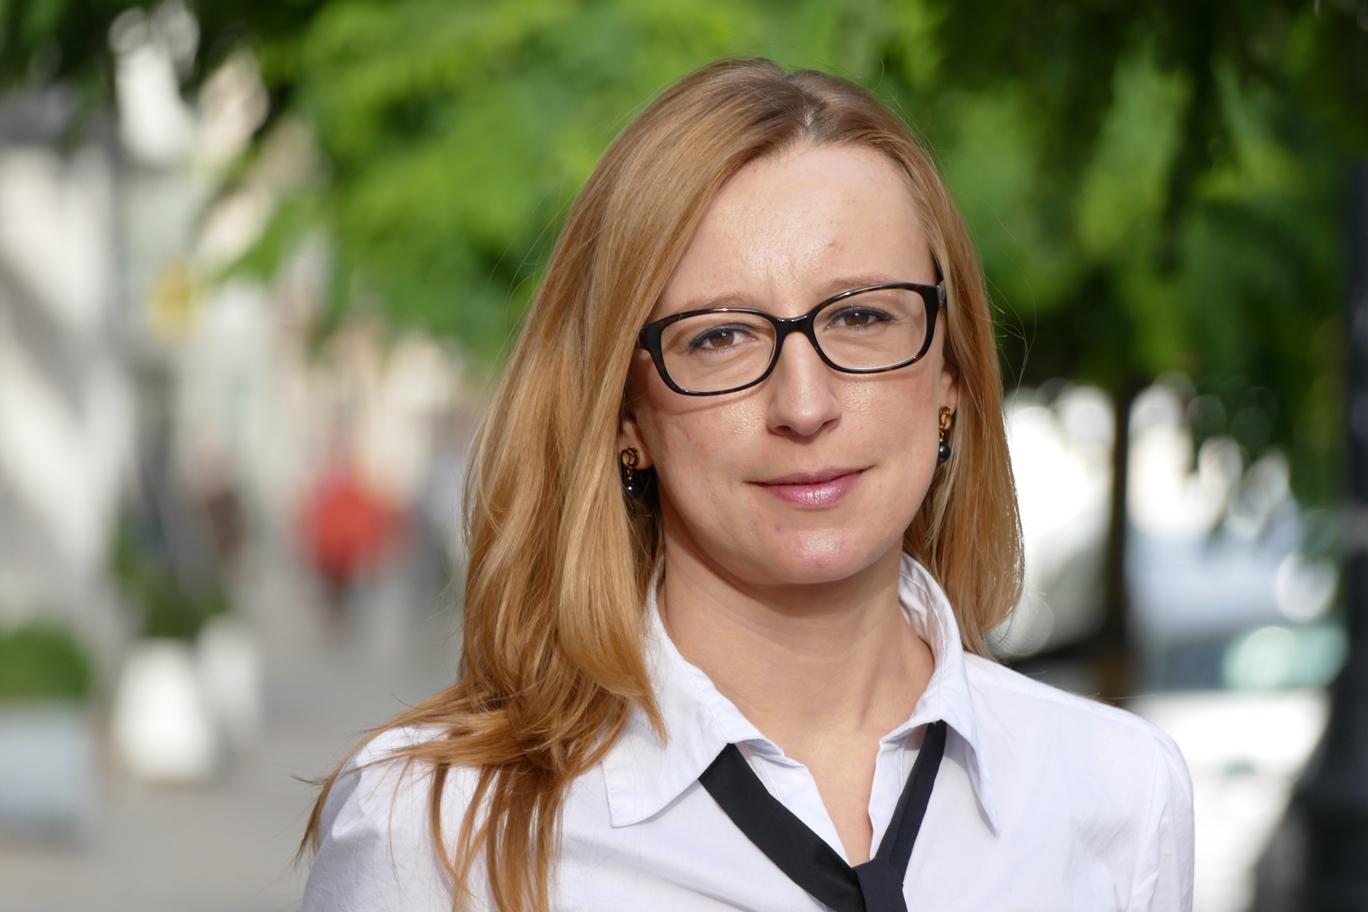 Marta Wronka-Tomulewicz